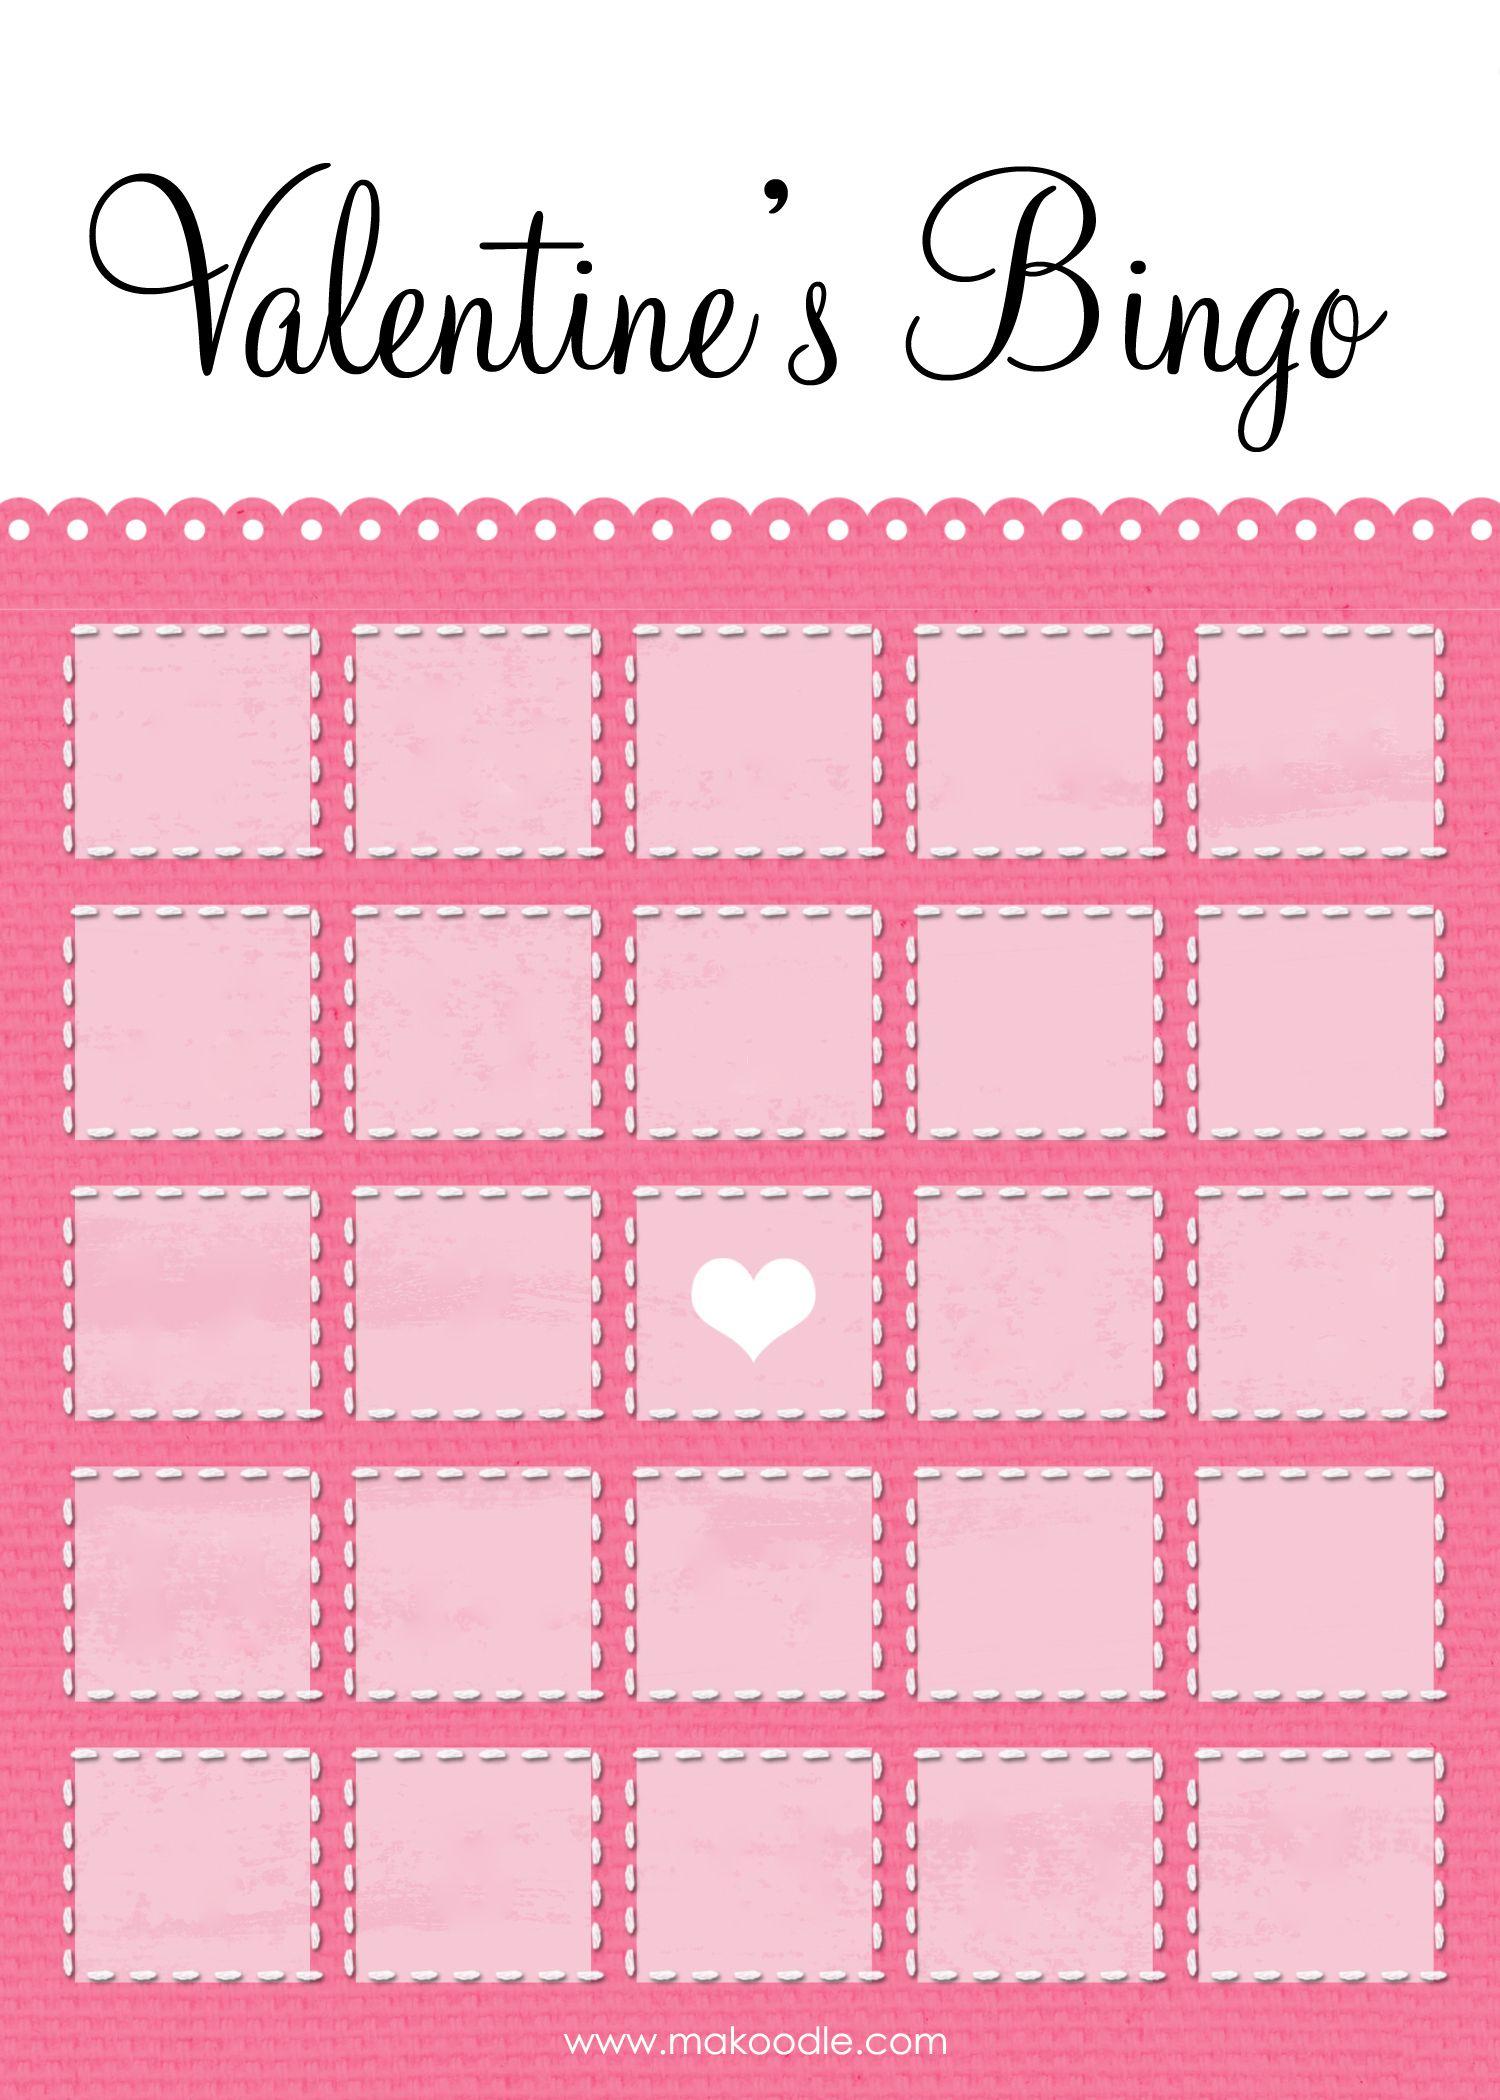 Valentines-Bingo-Elegant-Blank-Blog (1500×2100) | Bingo